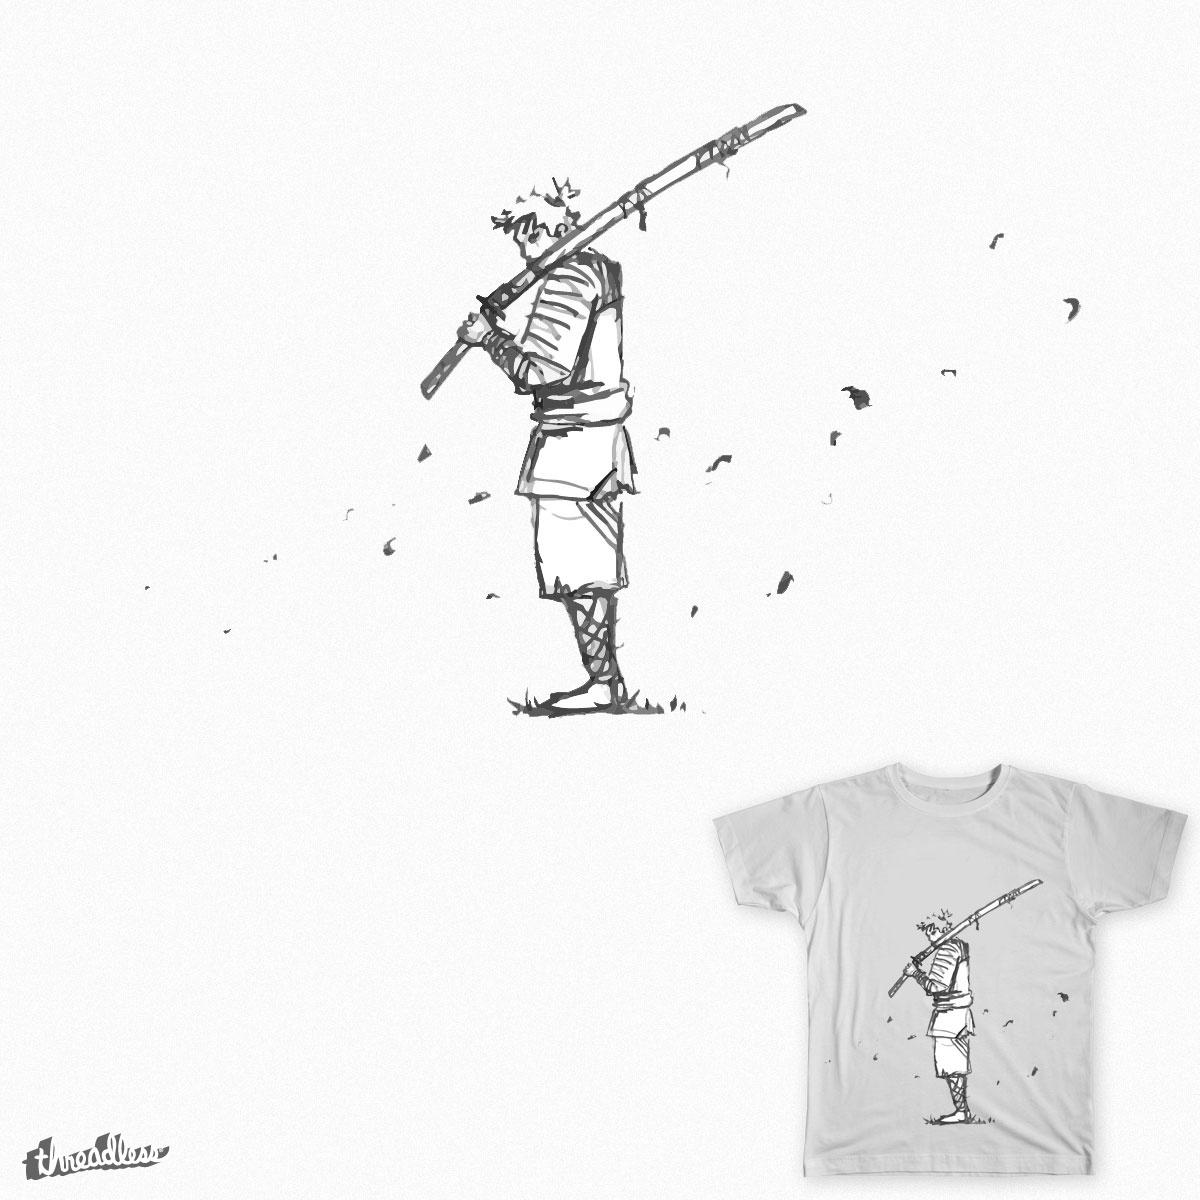 Samurai by rashed_art on Threadless